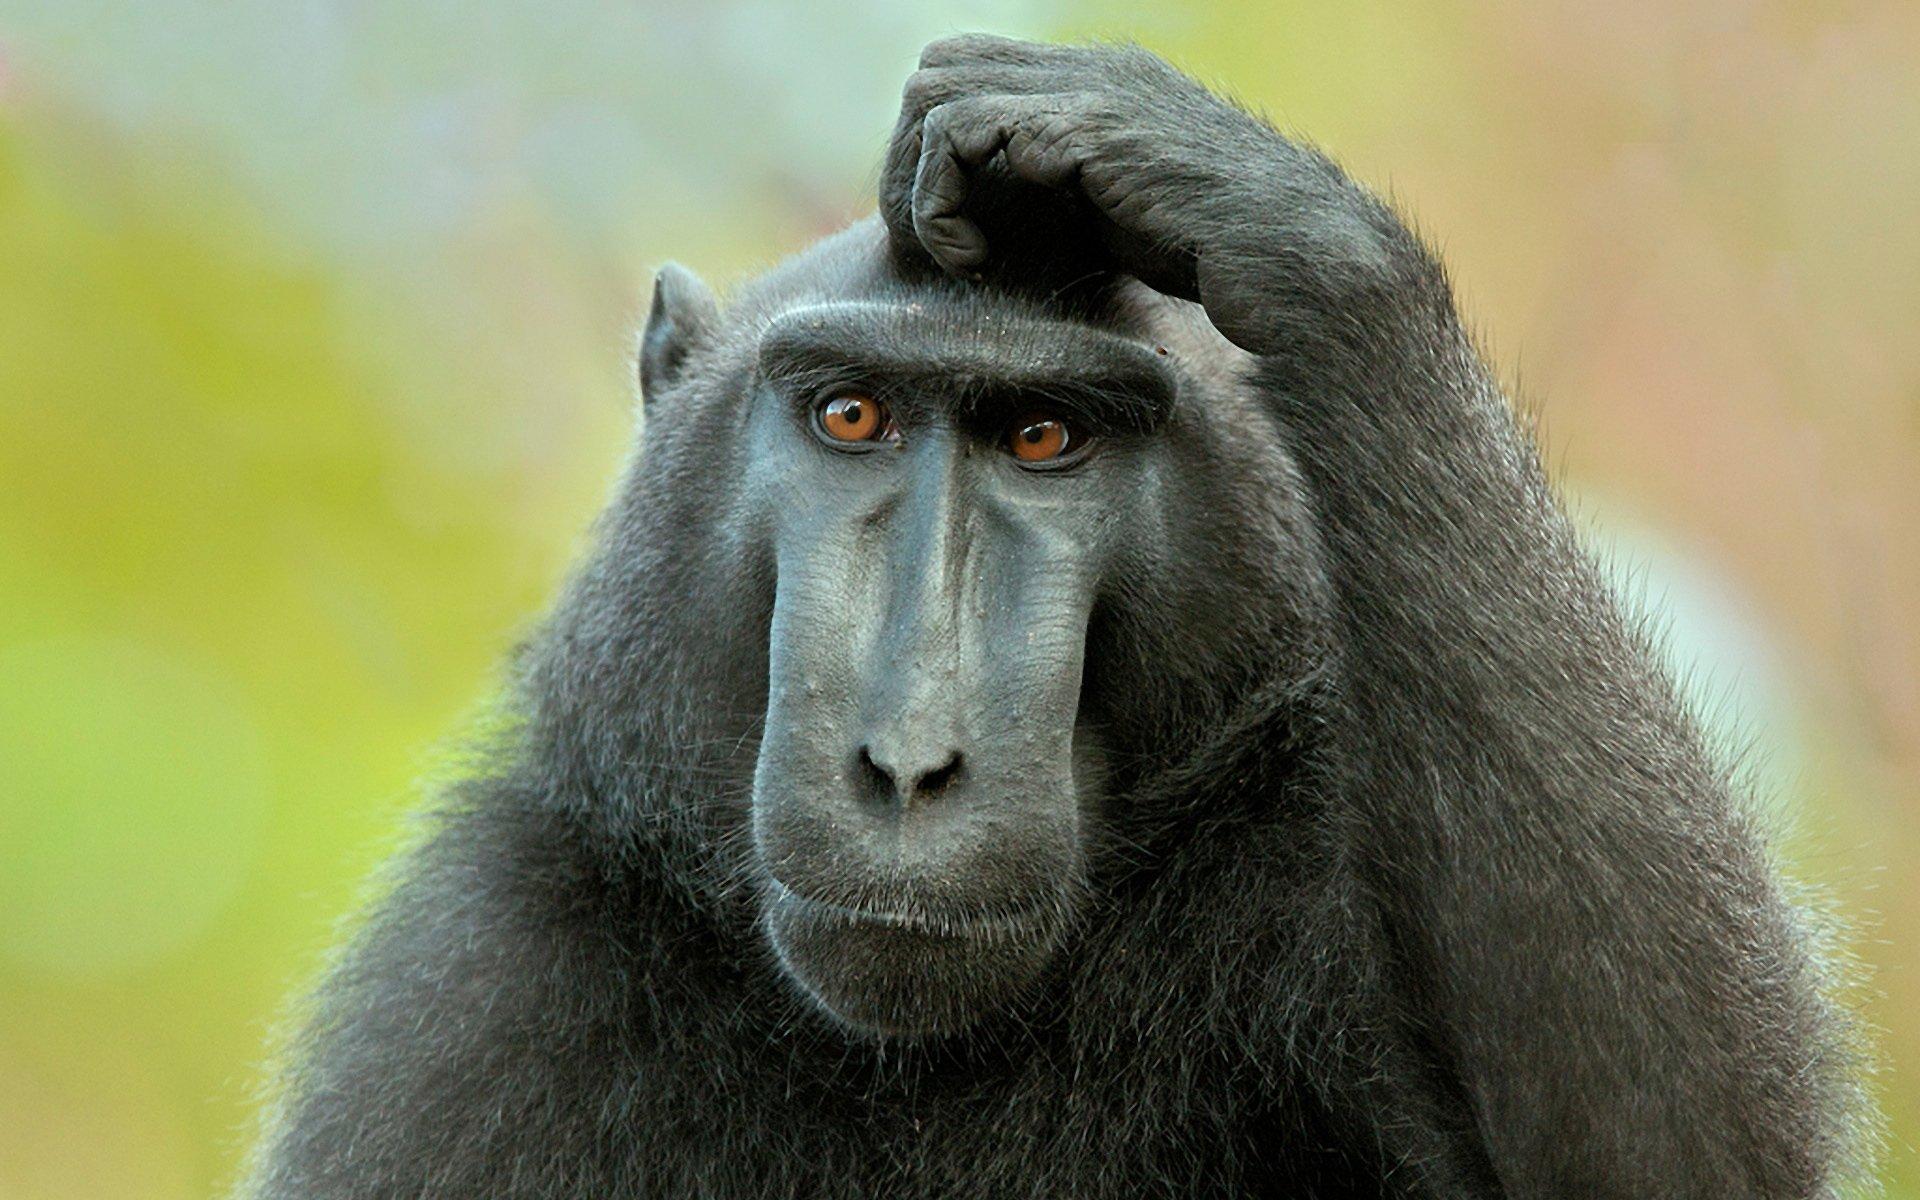 wallpaper-scratchi-desktop-monkey-sstorage-puzzled-image.jpg